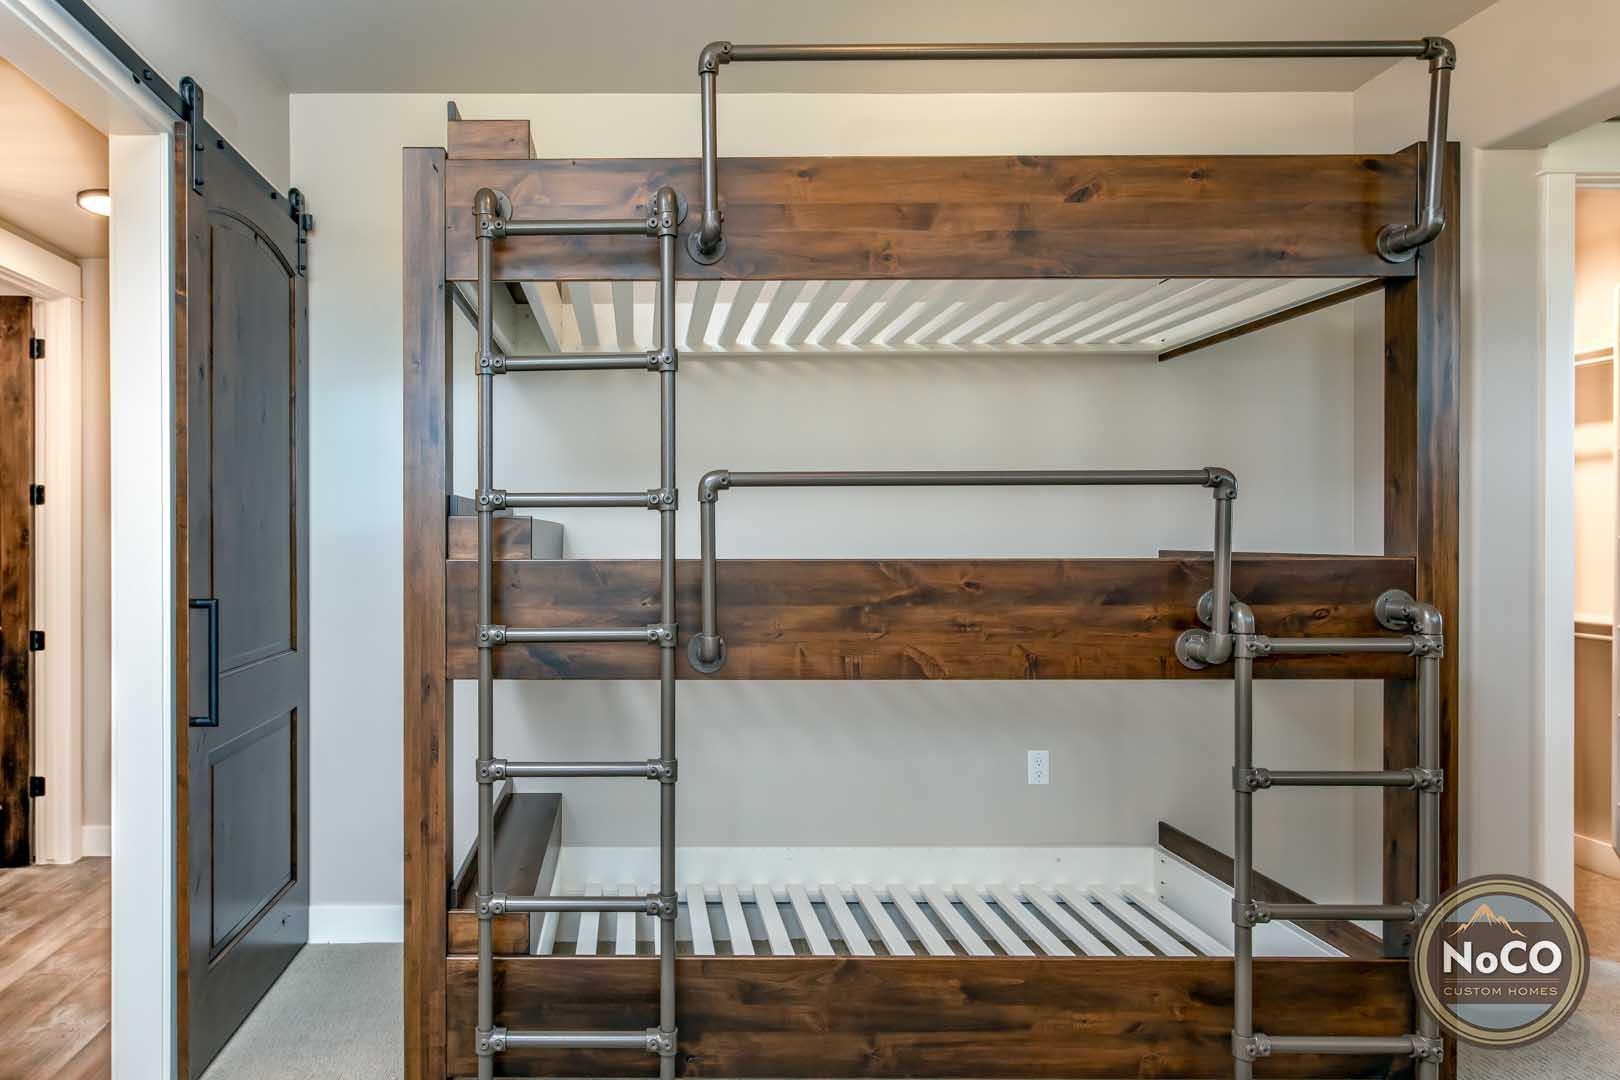 colorado custom home bedroom bunkbeds